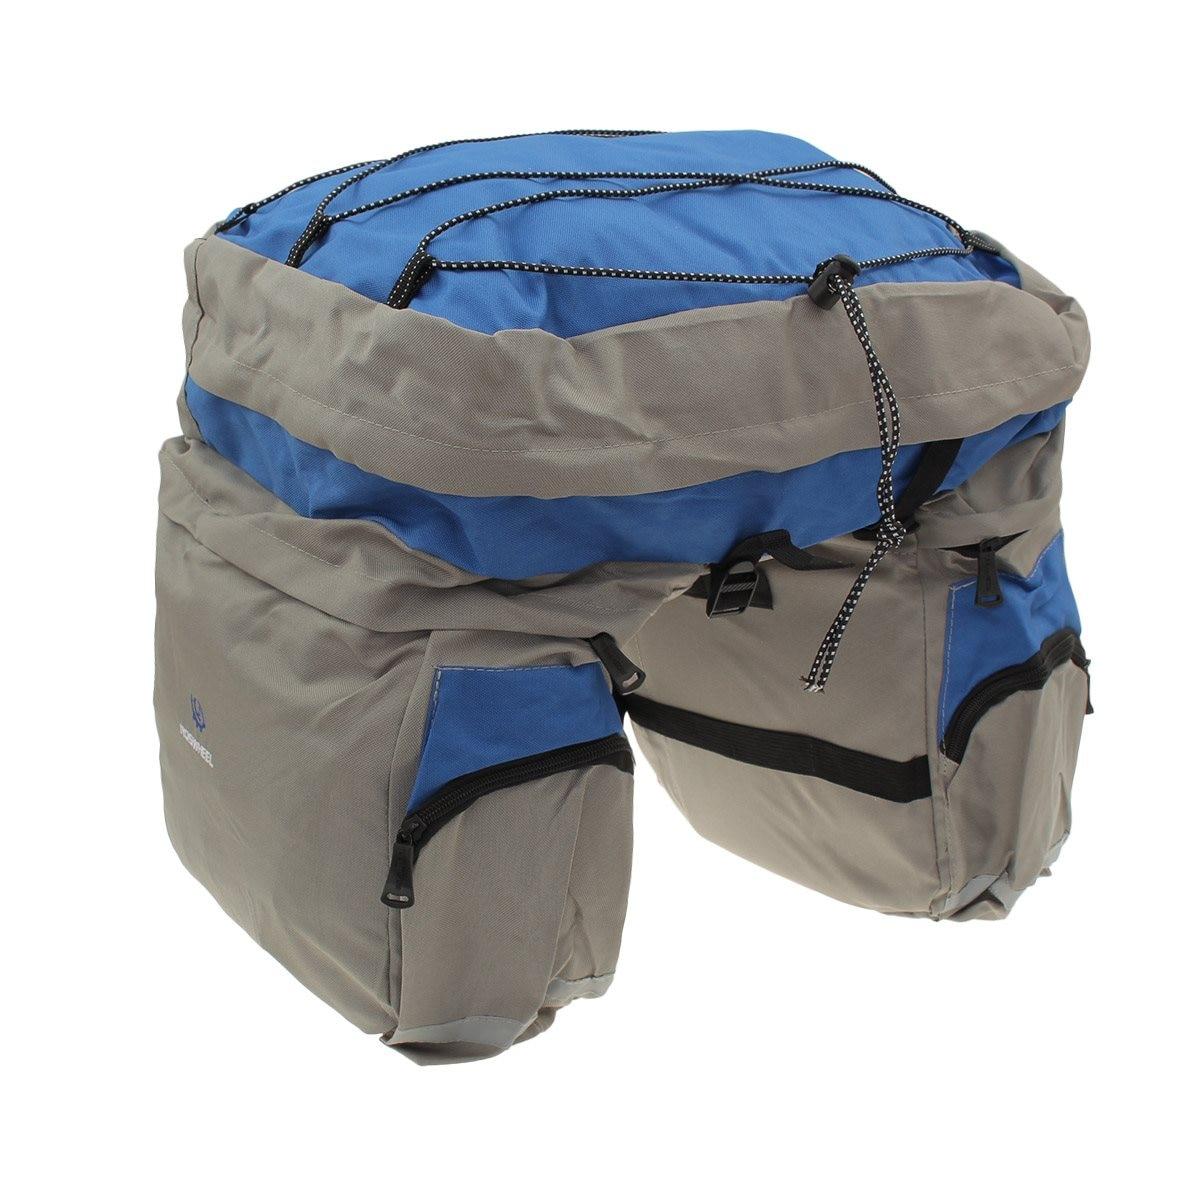 ФОТО ROSWHEEL Bicycle Large Triple Bike Cycling Rear Pannier Luggage Bag Rack+Waterproof Cover